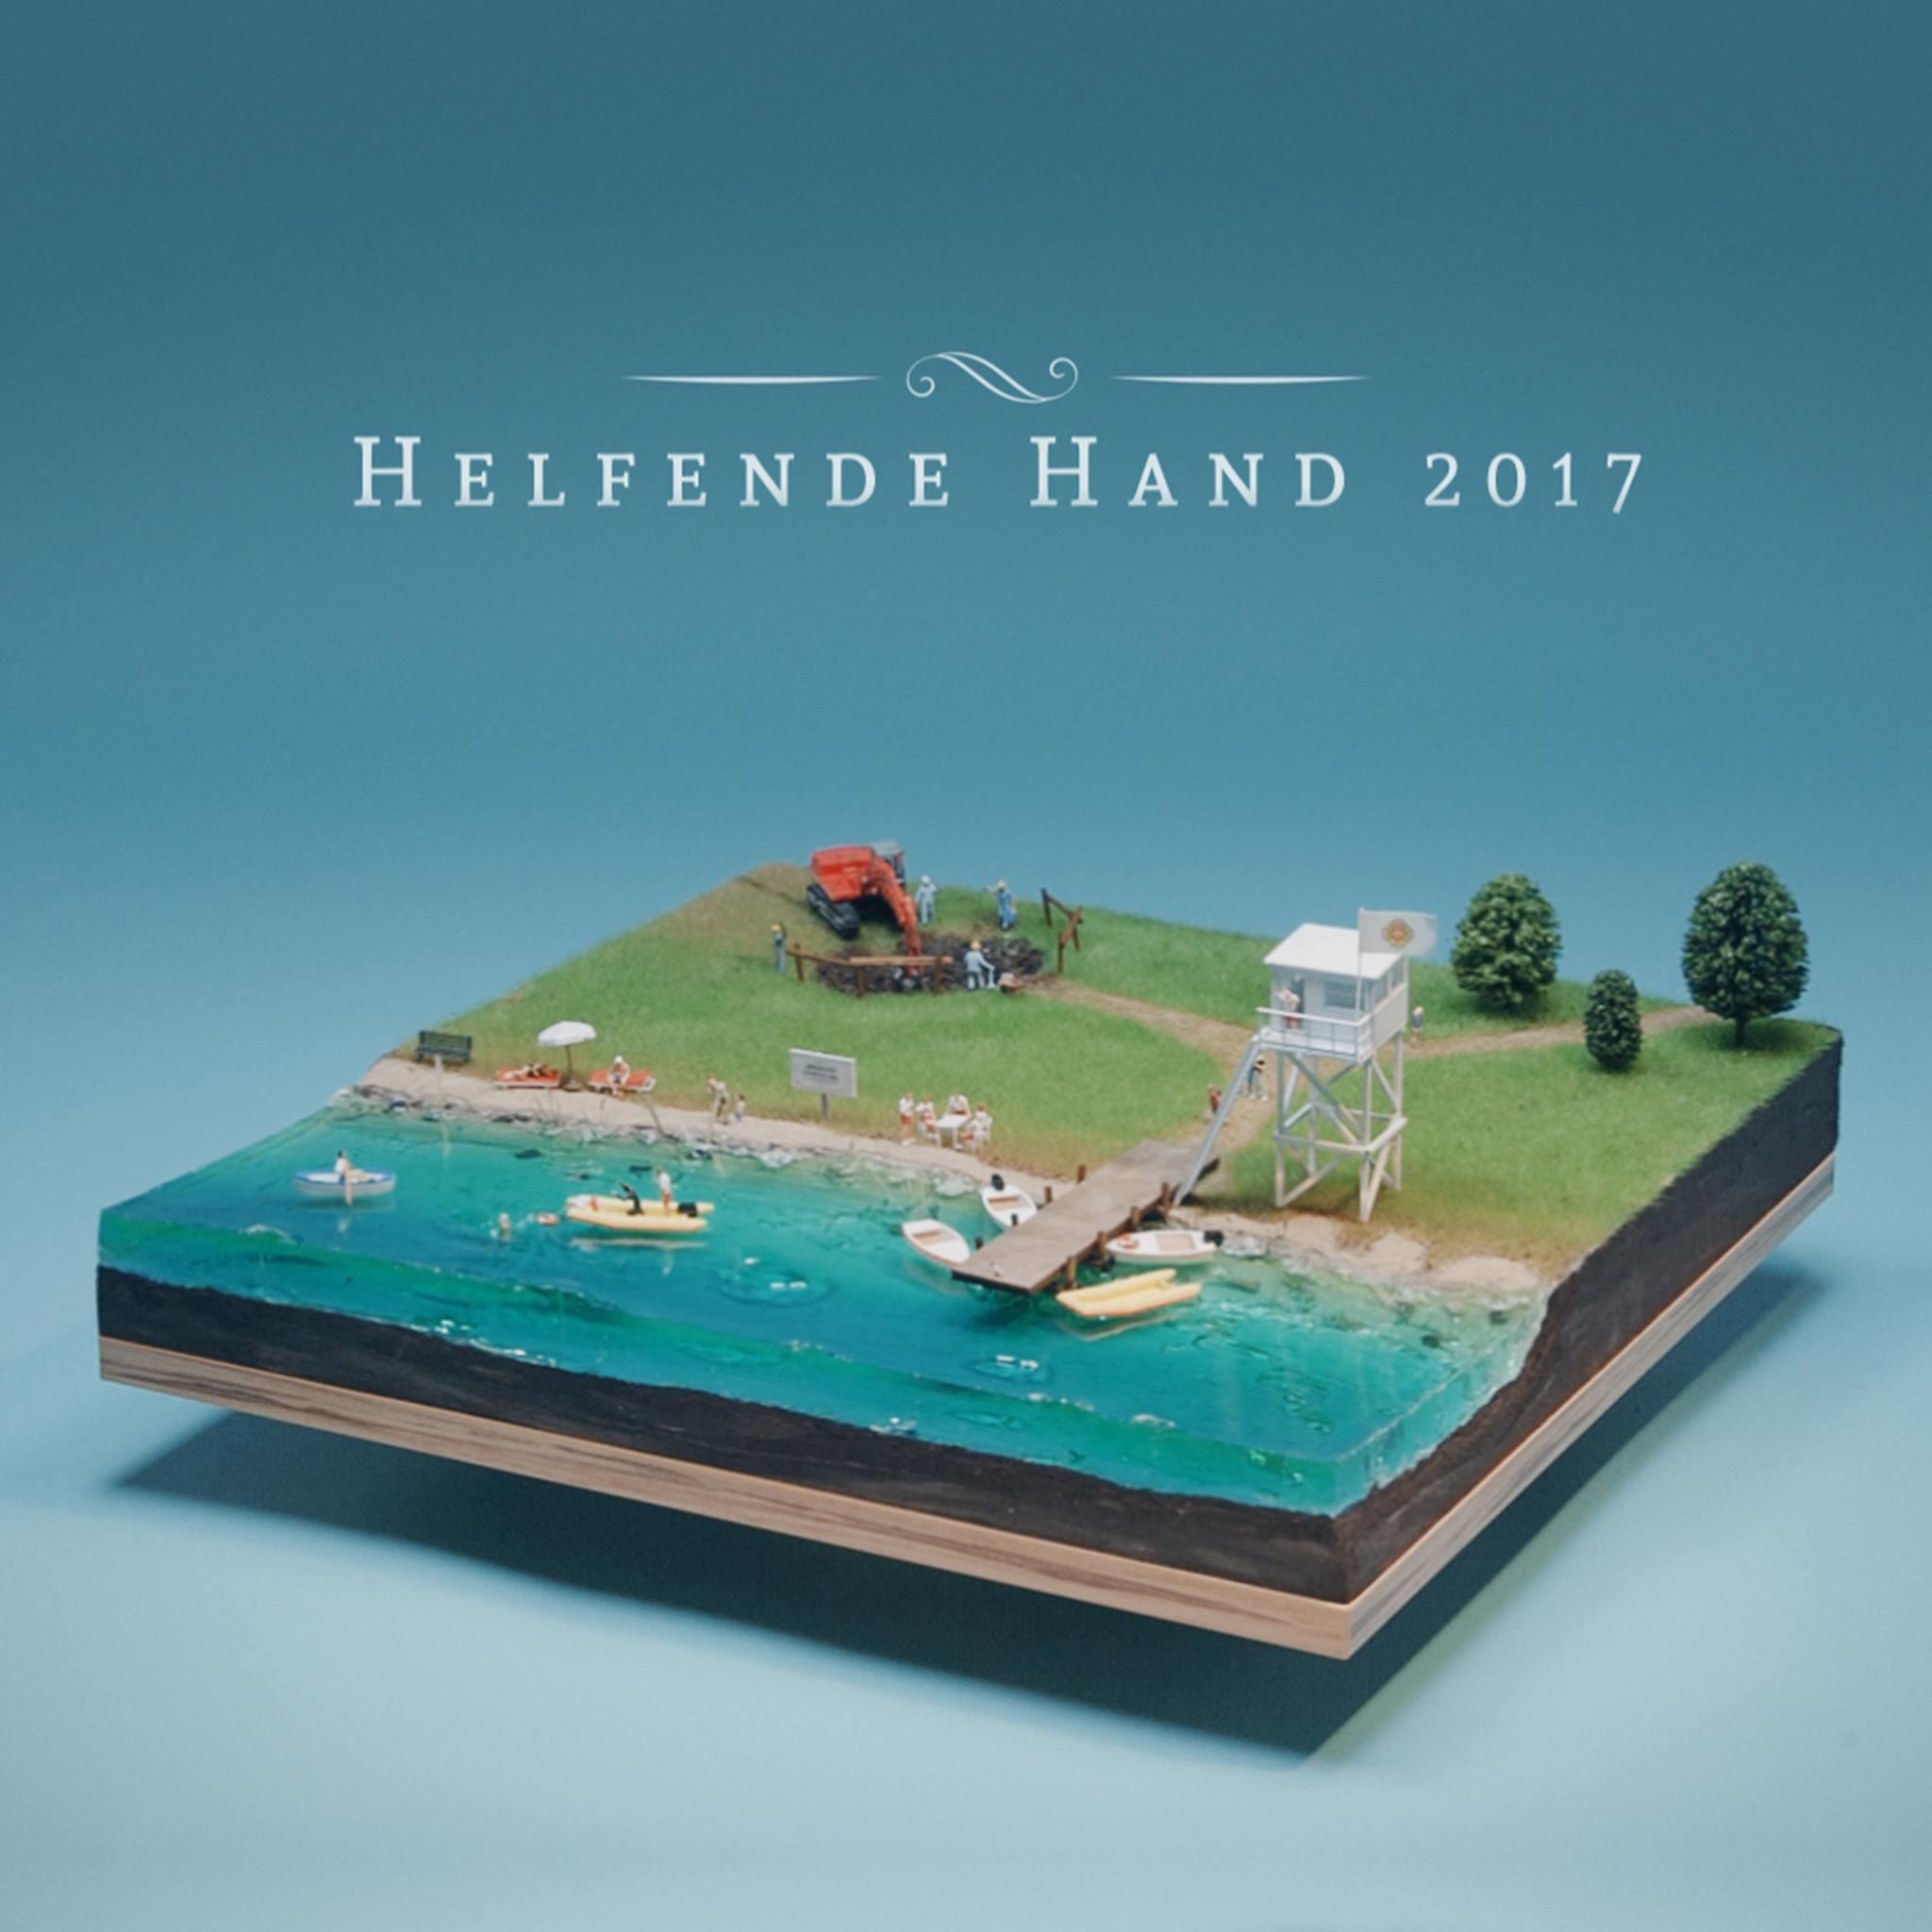 HELFENDE HAND AWARDS 2017